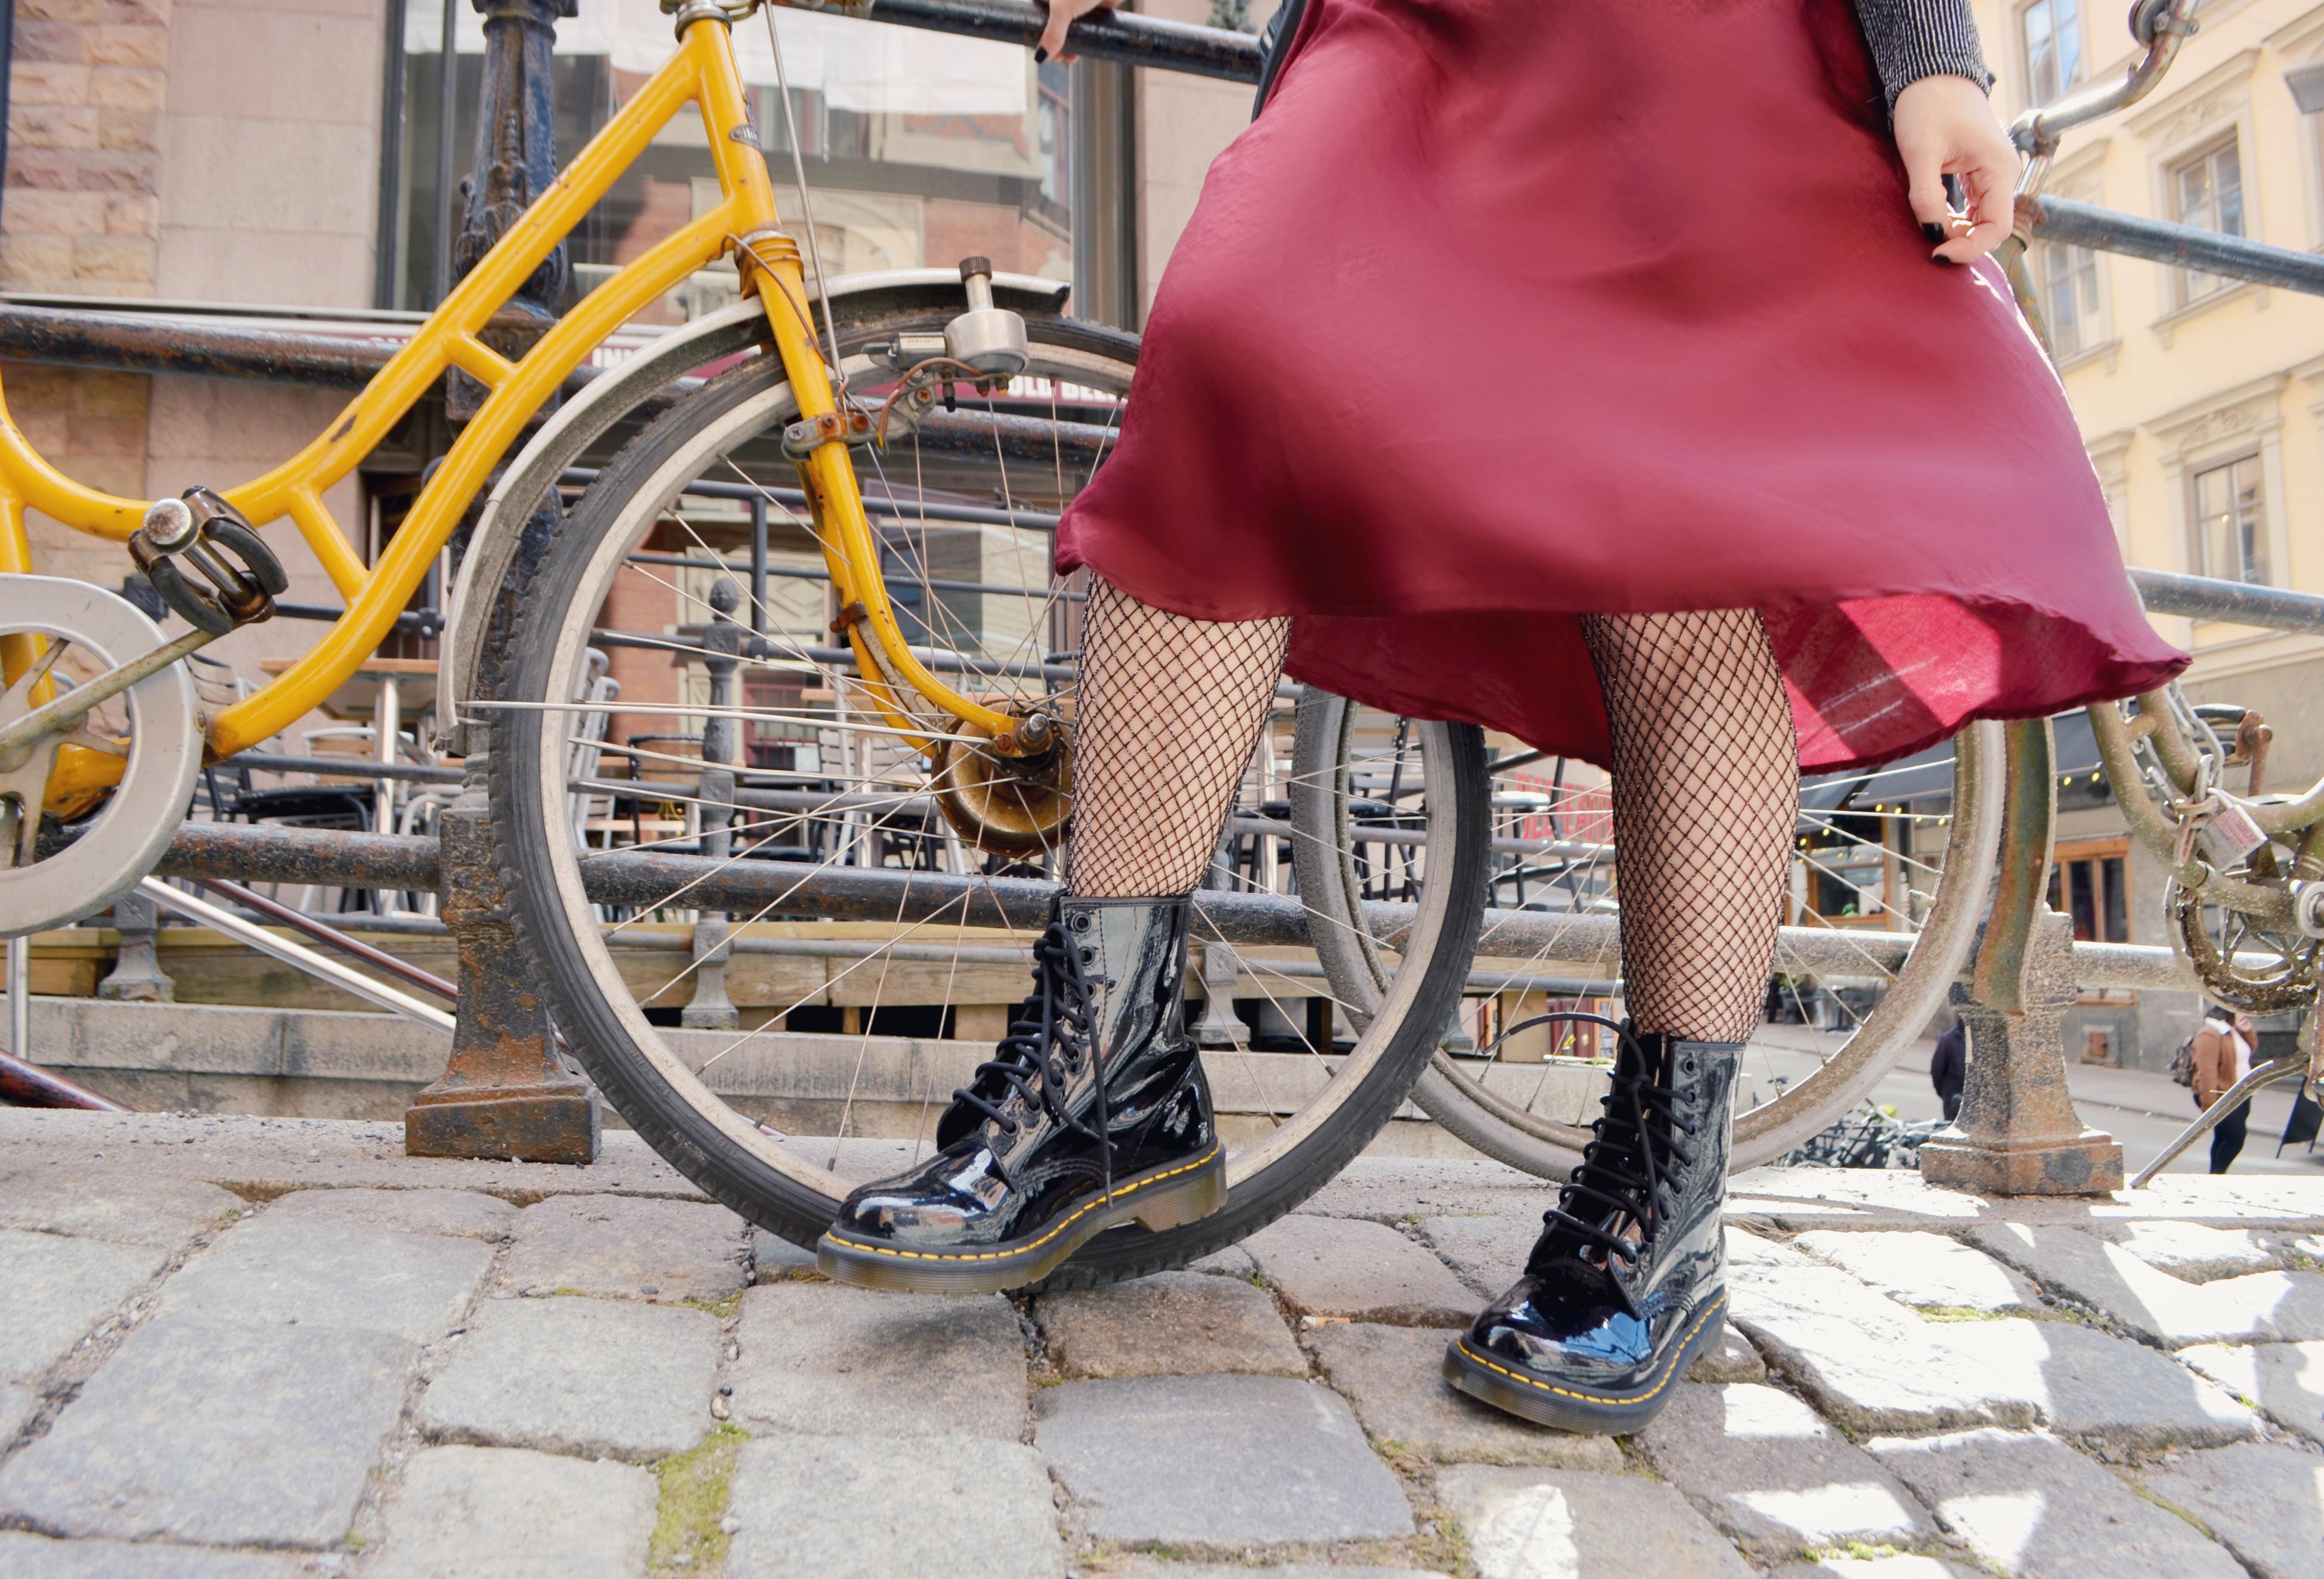 bershka-look-drmartens-style-ChicAdicta-blog-de-moda-Chic-Adicta-fashionista-medias-de-rejilla-Stockings-PiensaenChic-Piensa-en-Chic-influencer